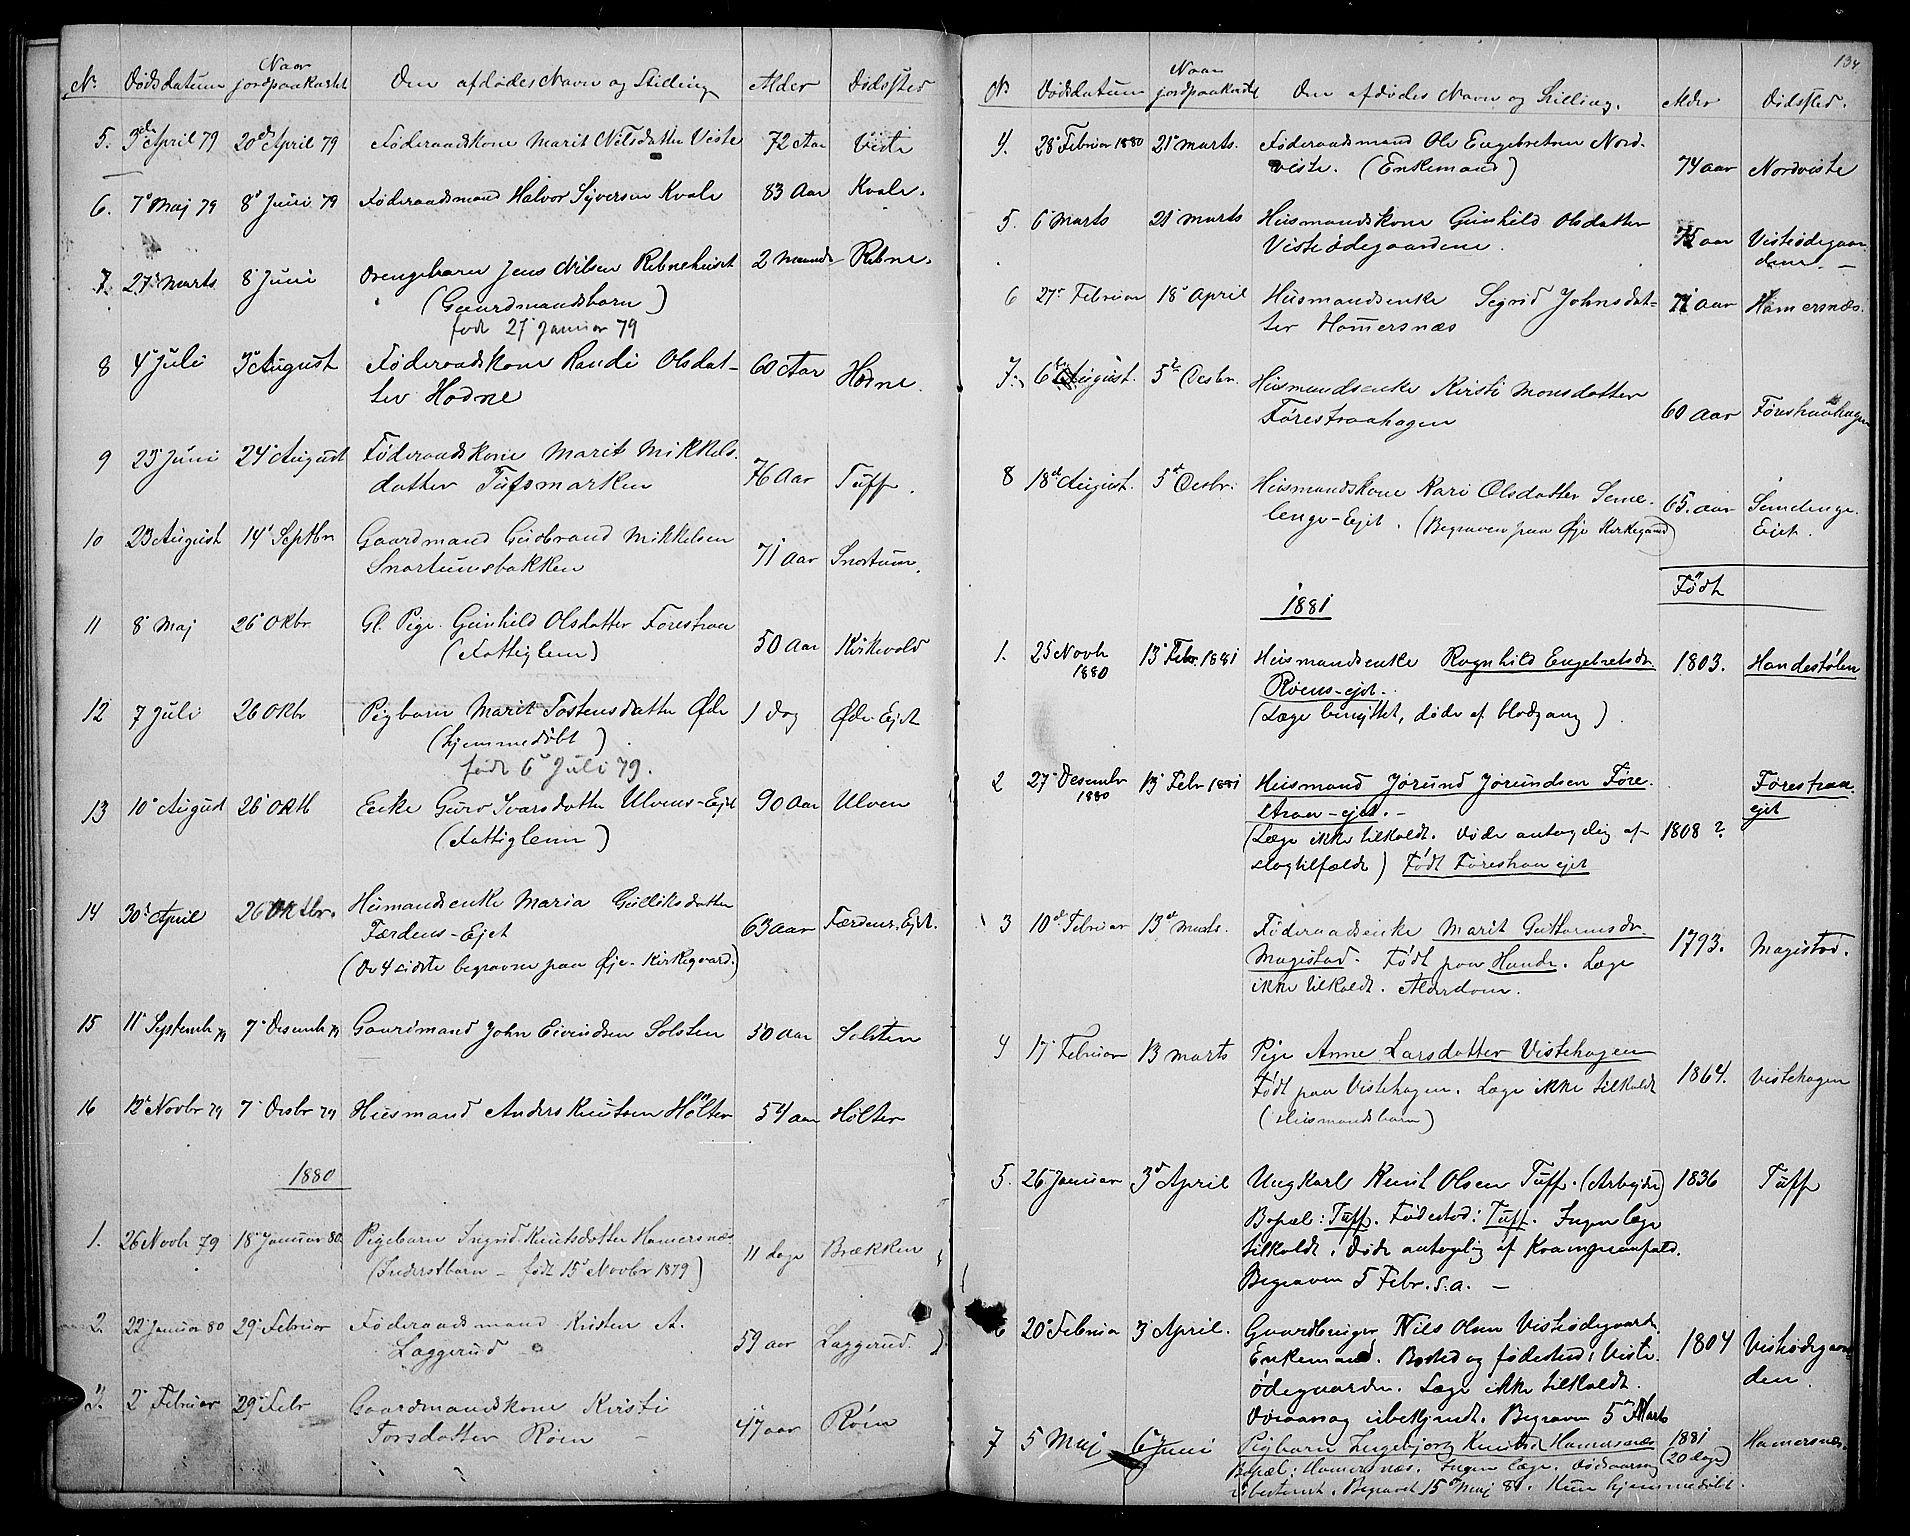 SAH, Vestre Slidre prestekontor, Klokkerbok nr. 3, 1869-1882, s. 134